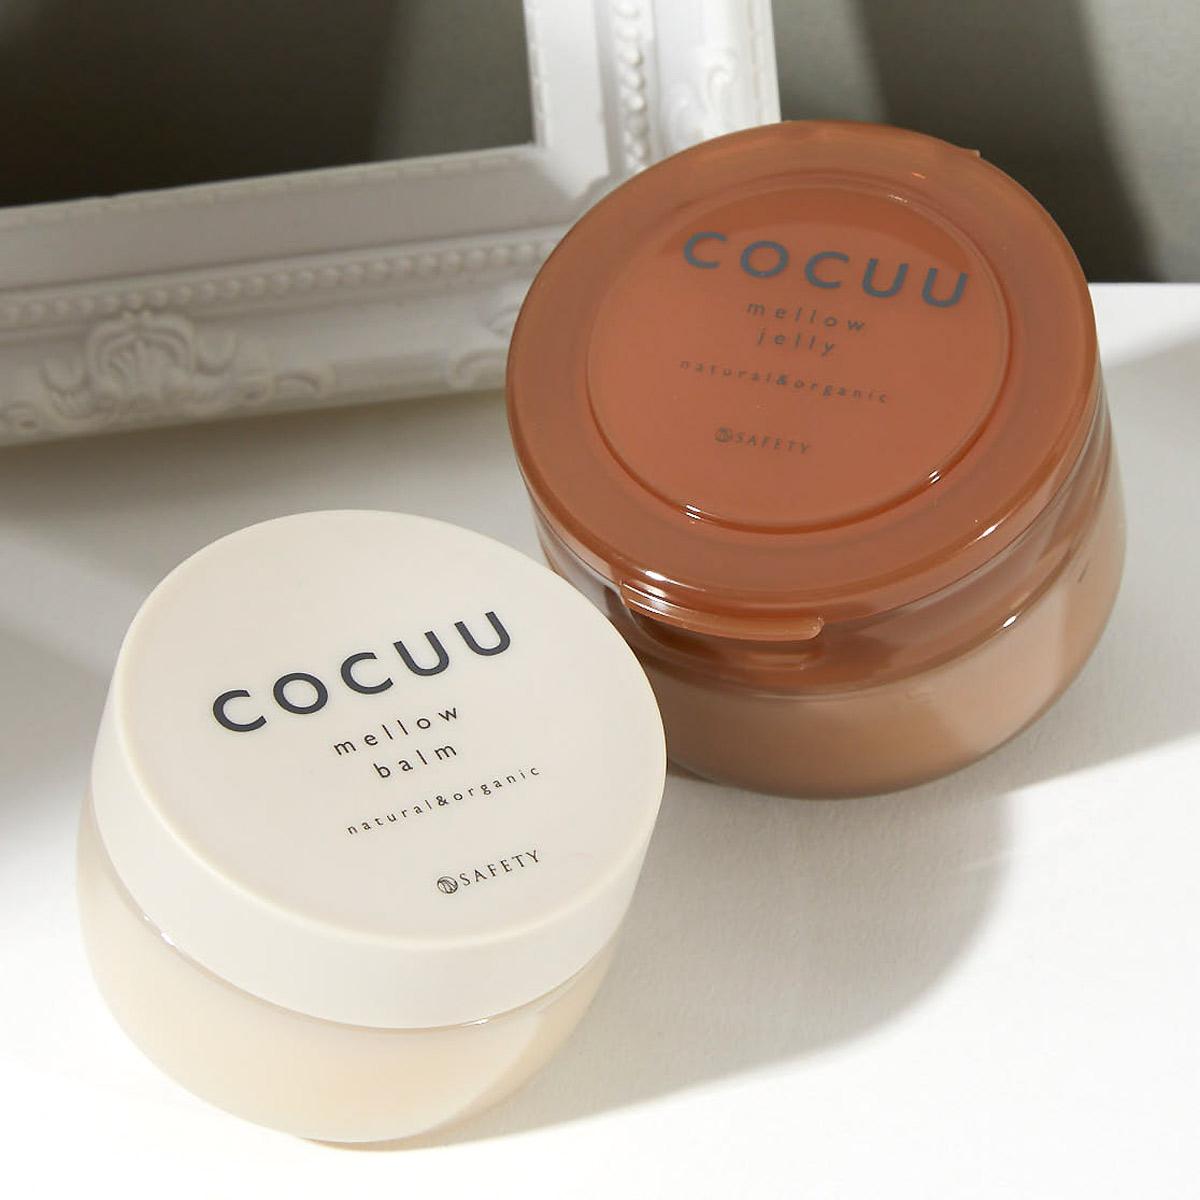 COCUU(コキュウ)『メロウジェリー』の使用感をレポに関する画像1